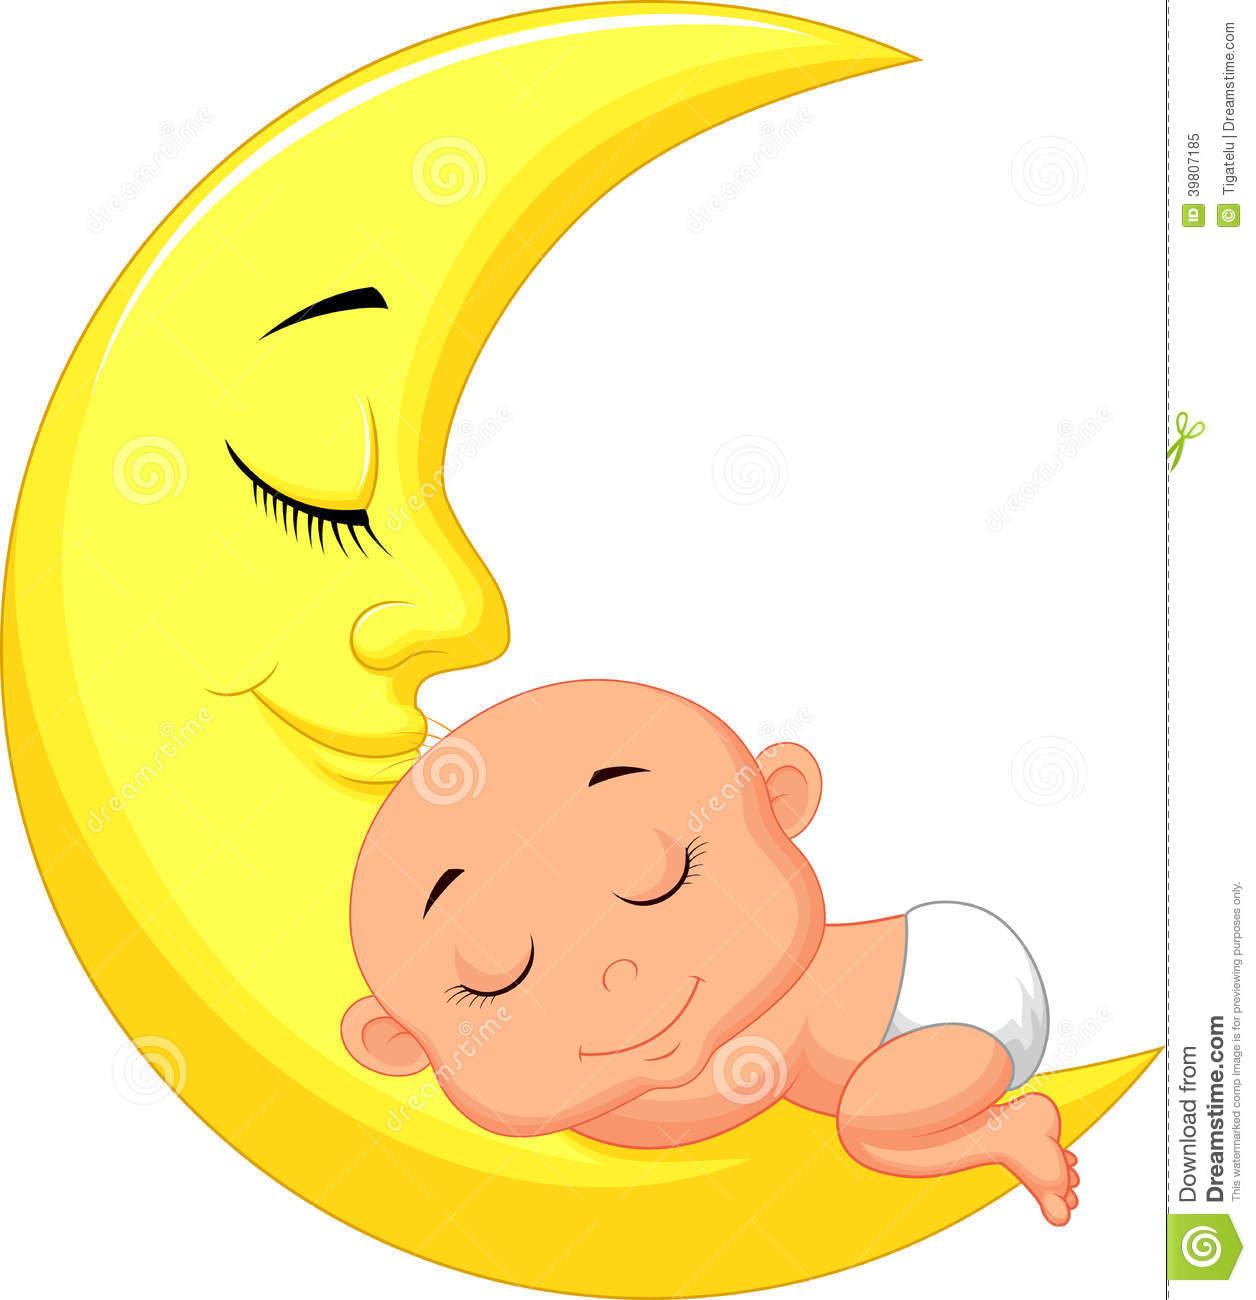 Similiar Toddler Sleeping Cartoon Keywords